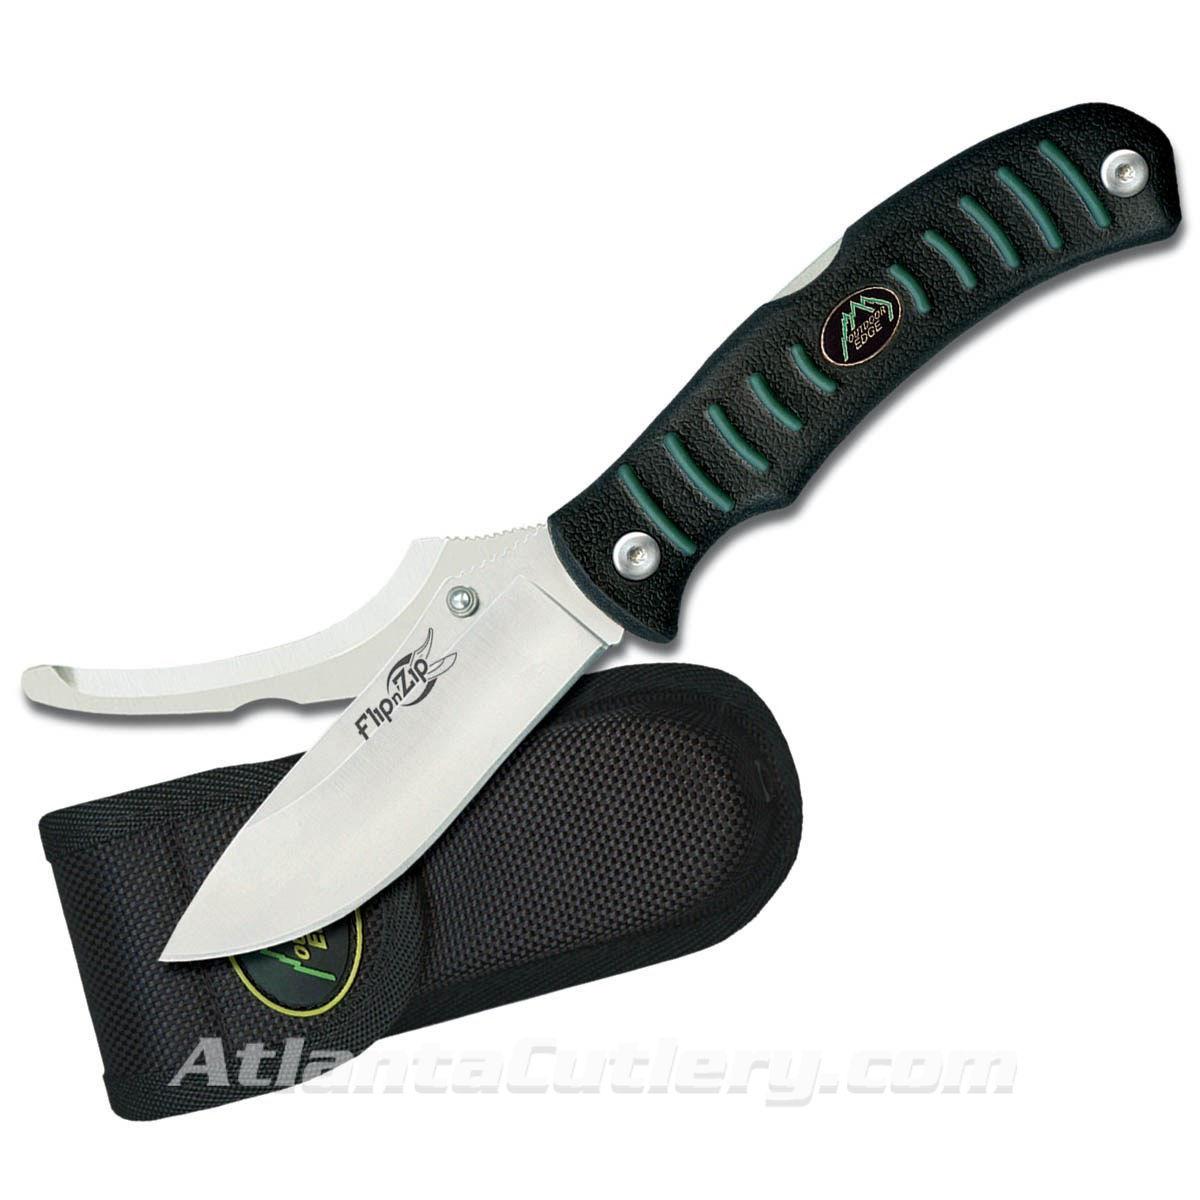 Flip 'N Zip Knife with Durable Nylon Sheath